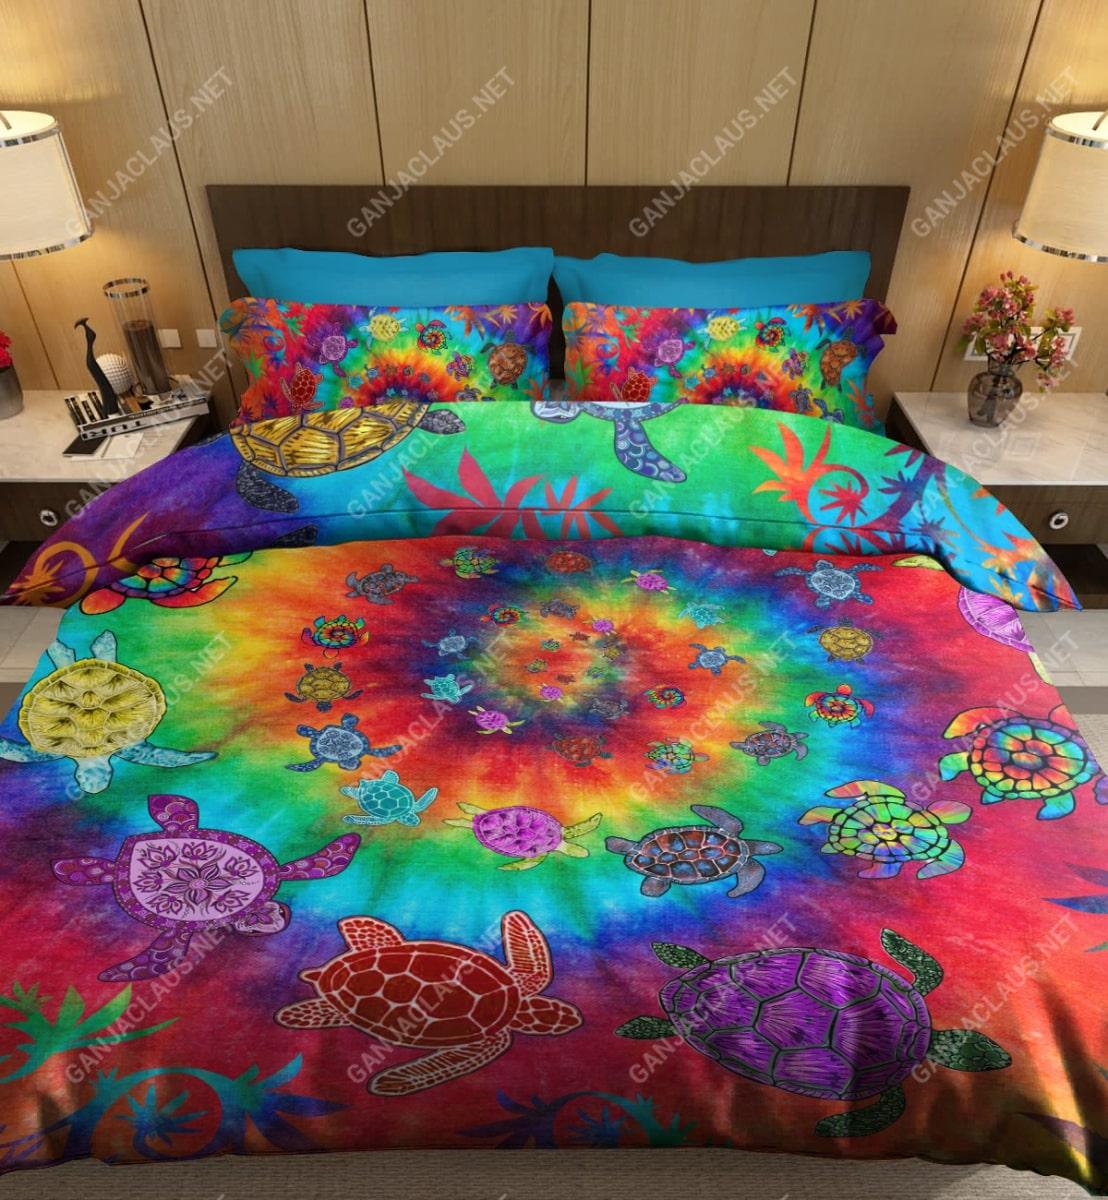 sea turtle tie dye full printing bedding set 2